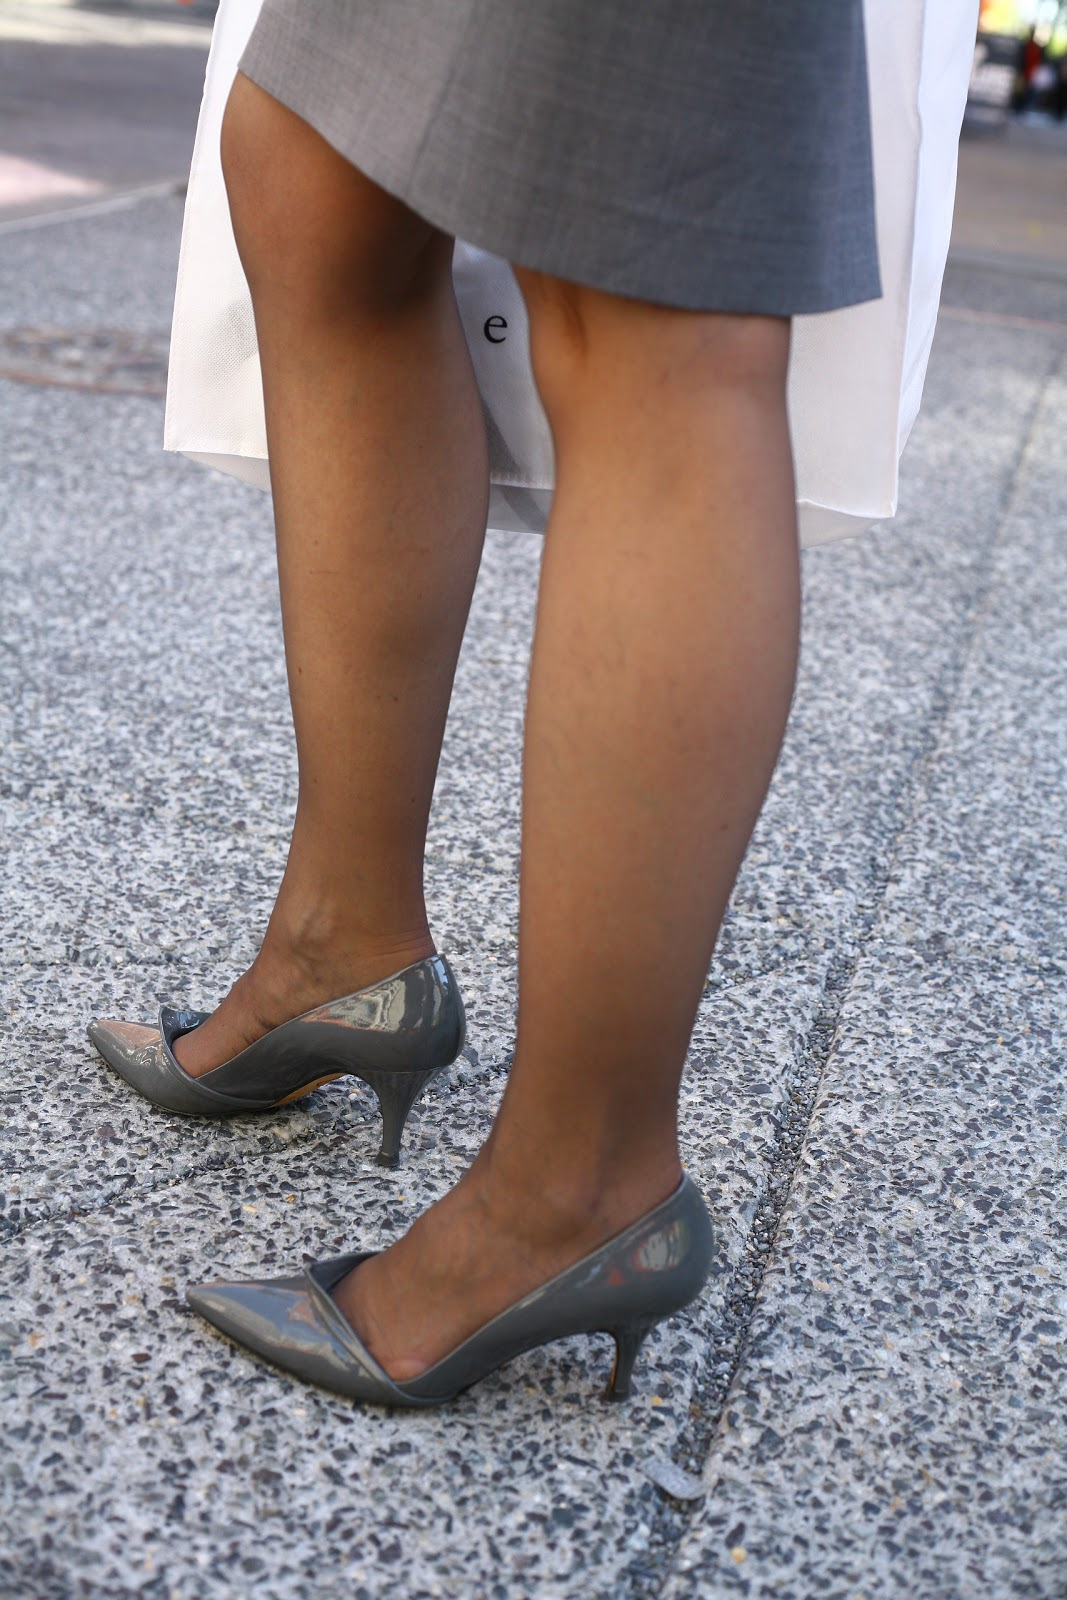 Nylons and heels phrase